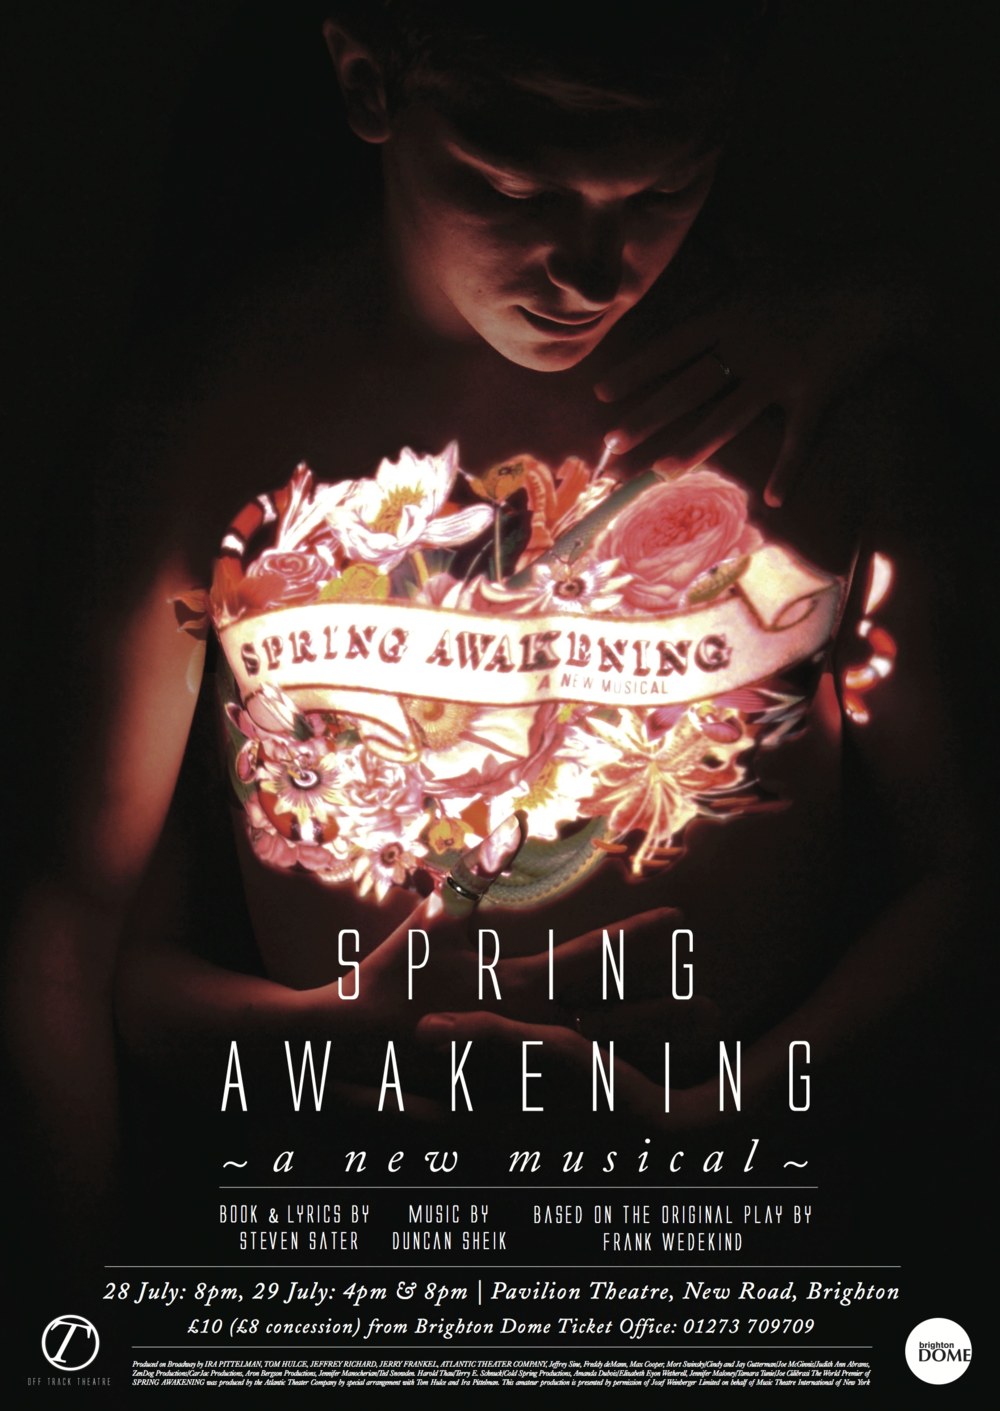 Spring Awakening artwork, Brighton Festival 2012, musical director - Jude Obermüller